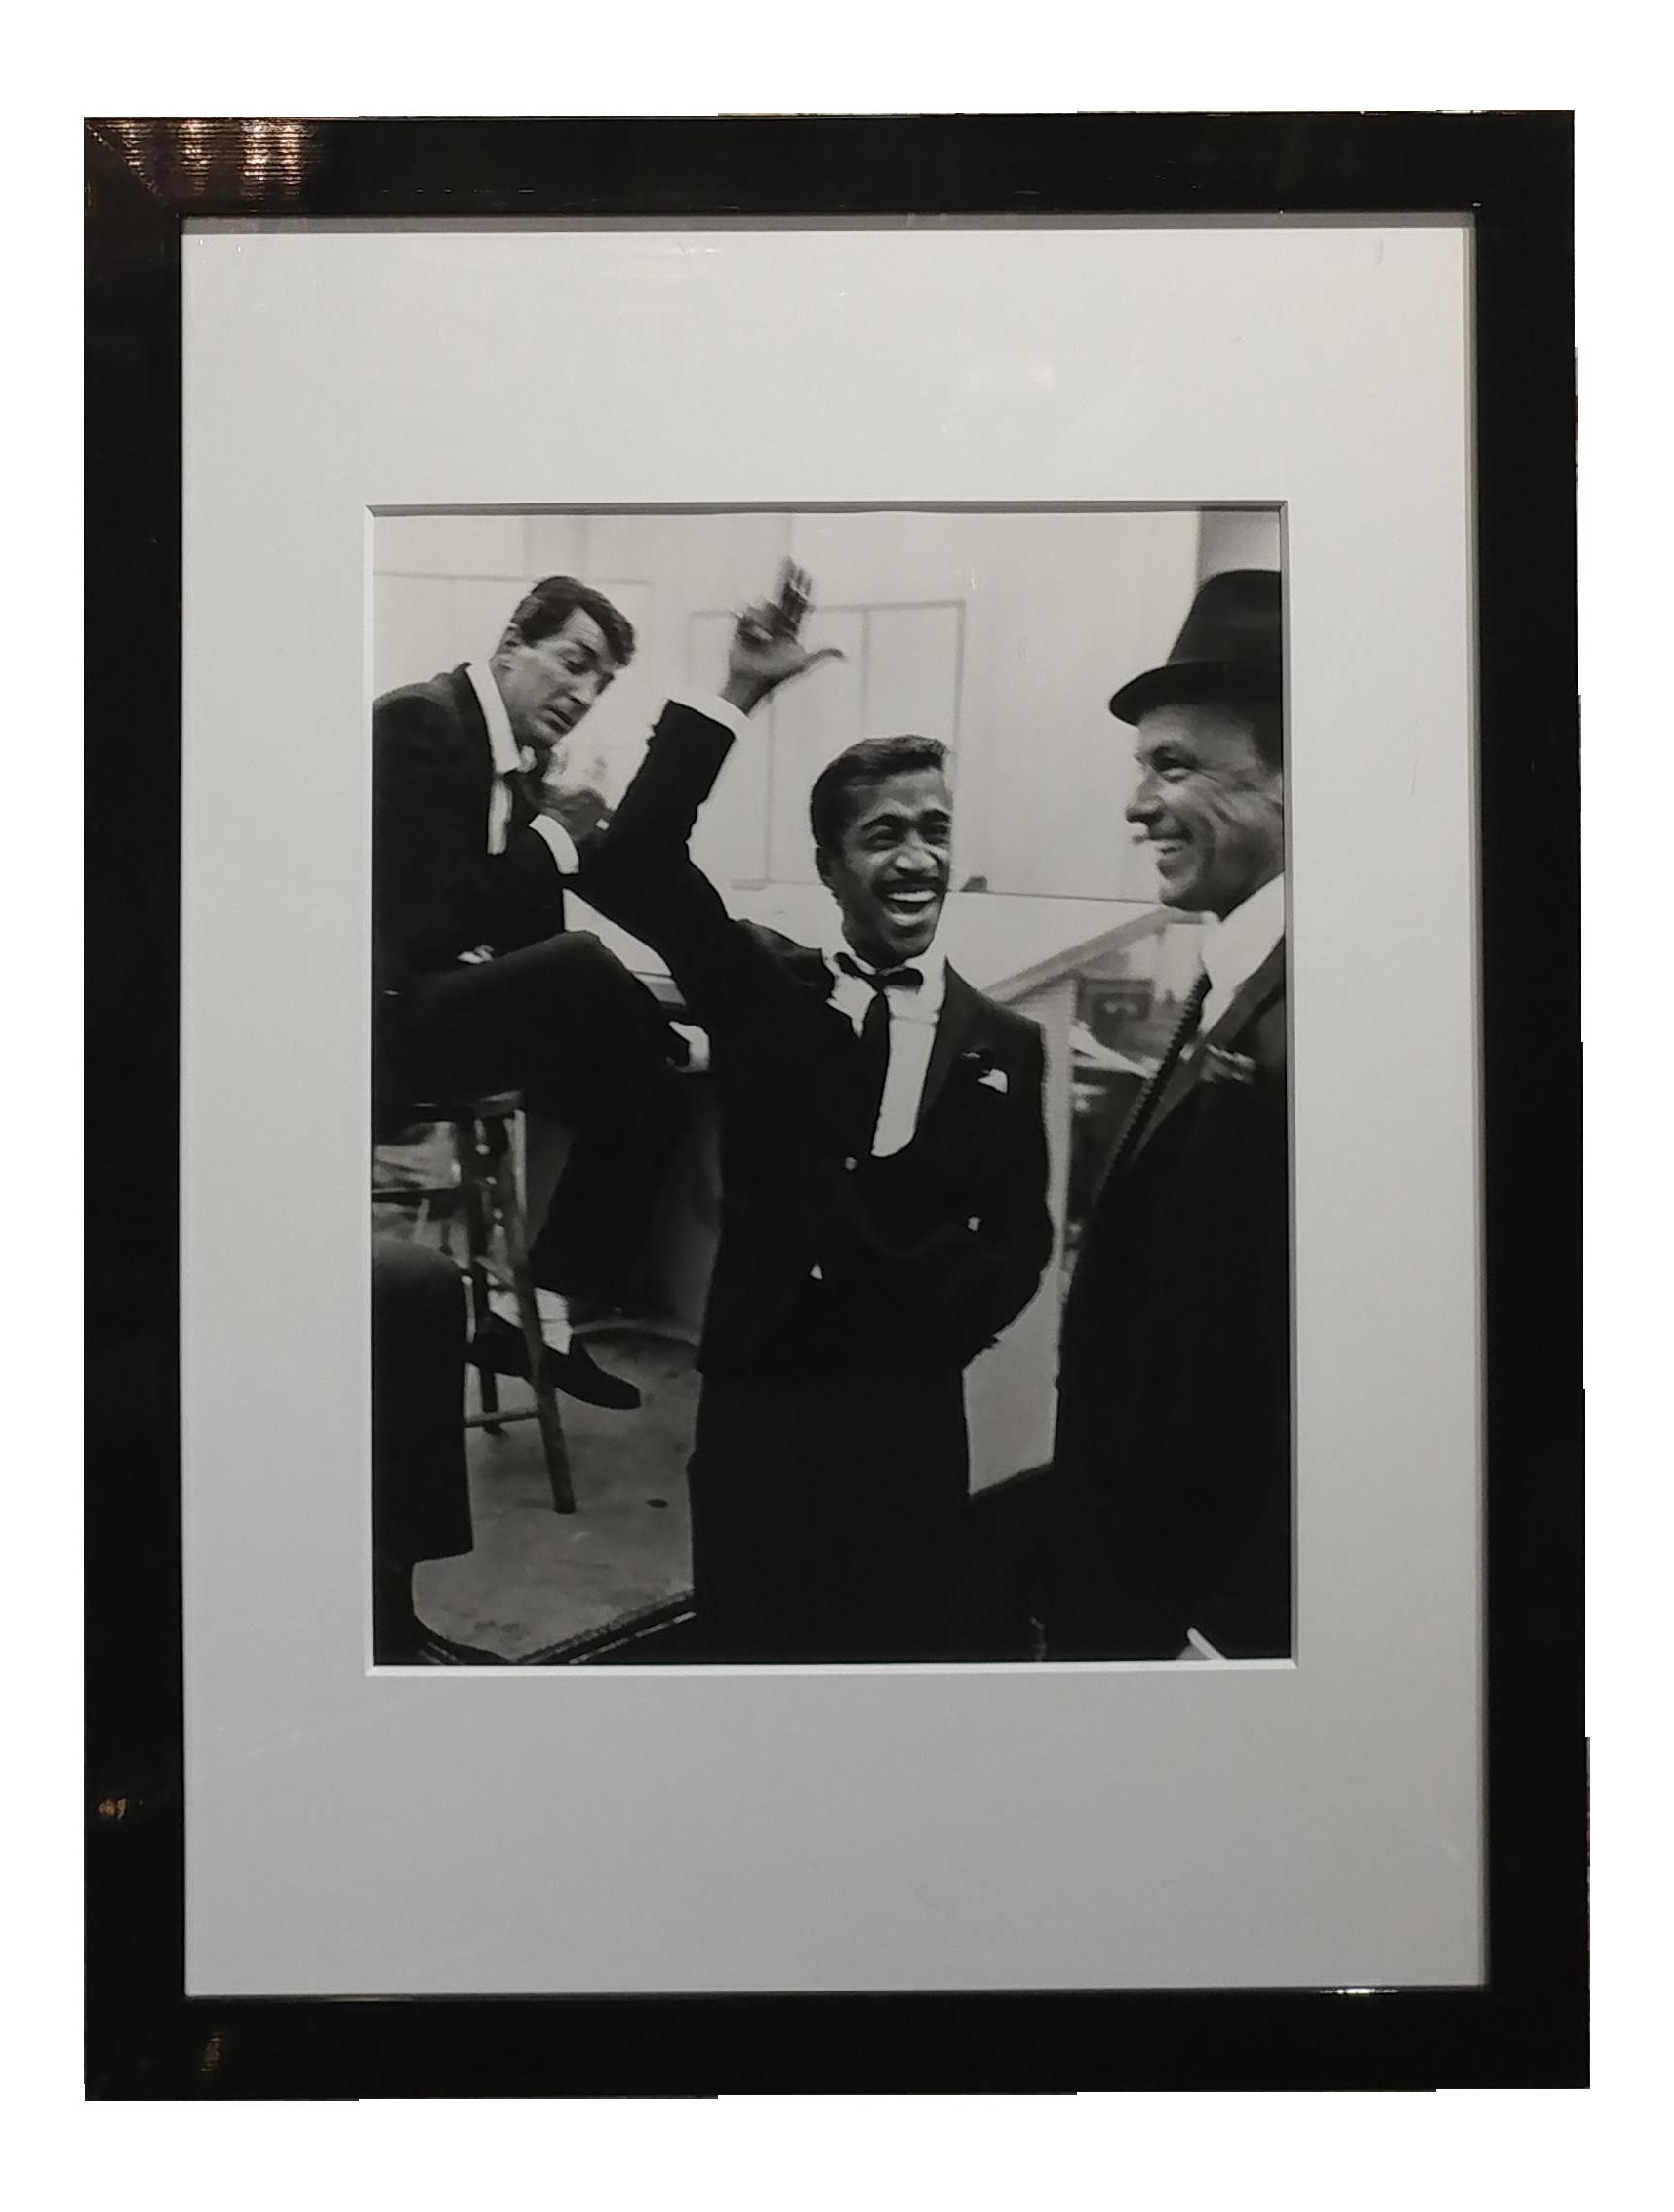 Rat Pack Dean Martin Frank Sinatra And Sammy Davis Jnr Framed Photo